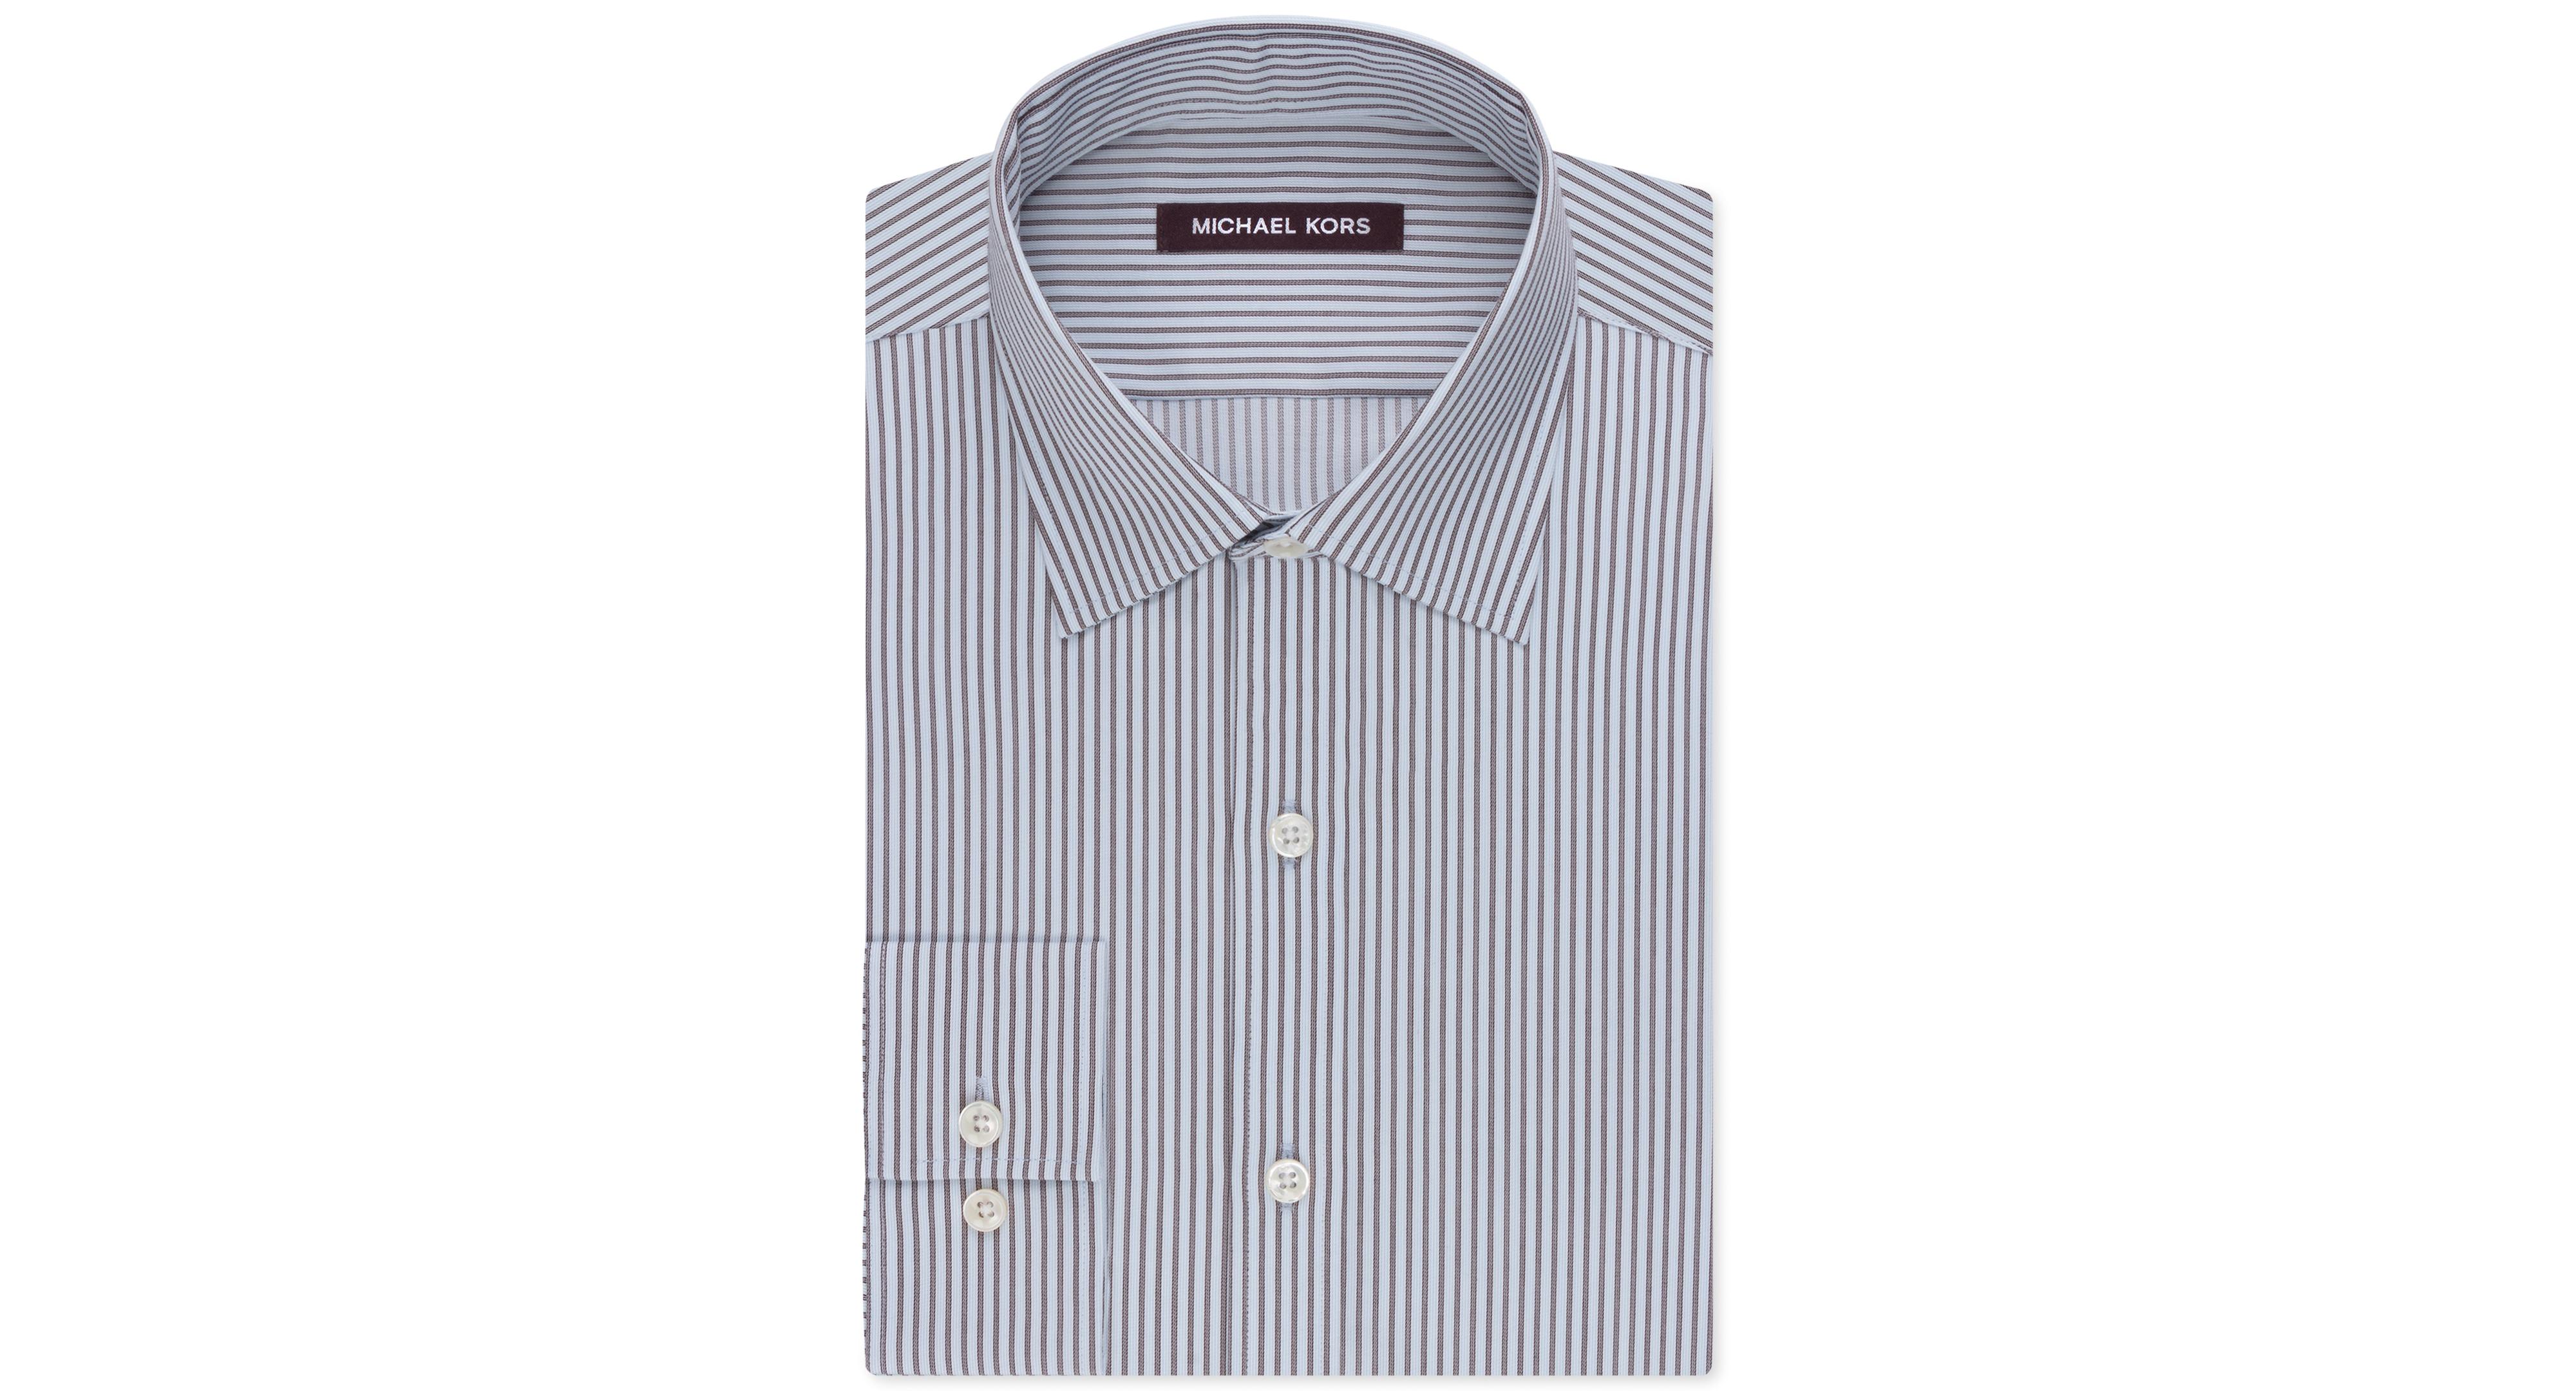 Michael Kors Tobacco Stripe French Cuff Dress Shirt